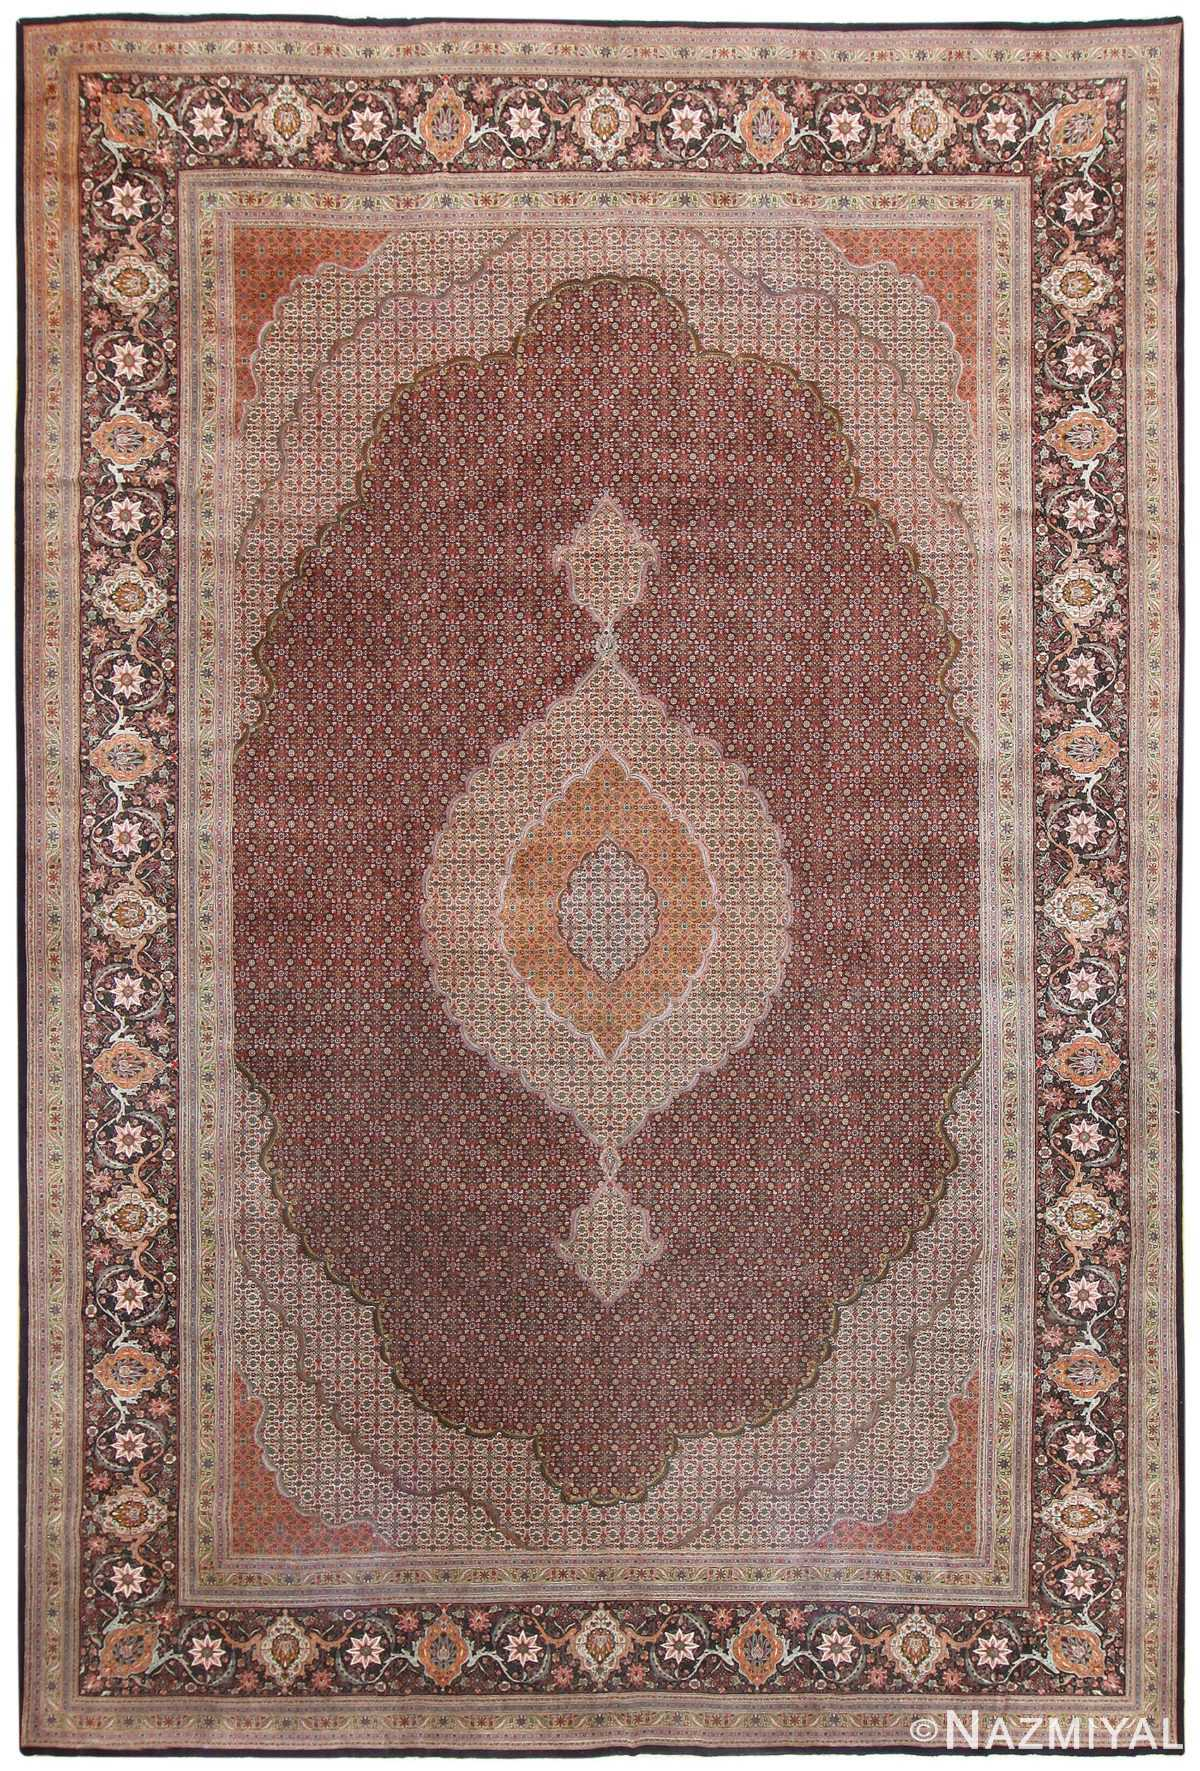 Persian Tabriz Carpet 50316 Detail/Large View